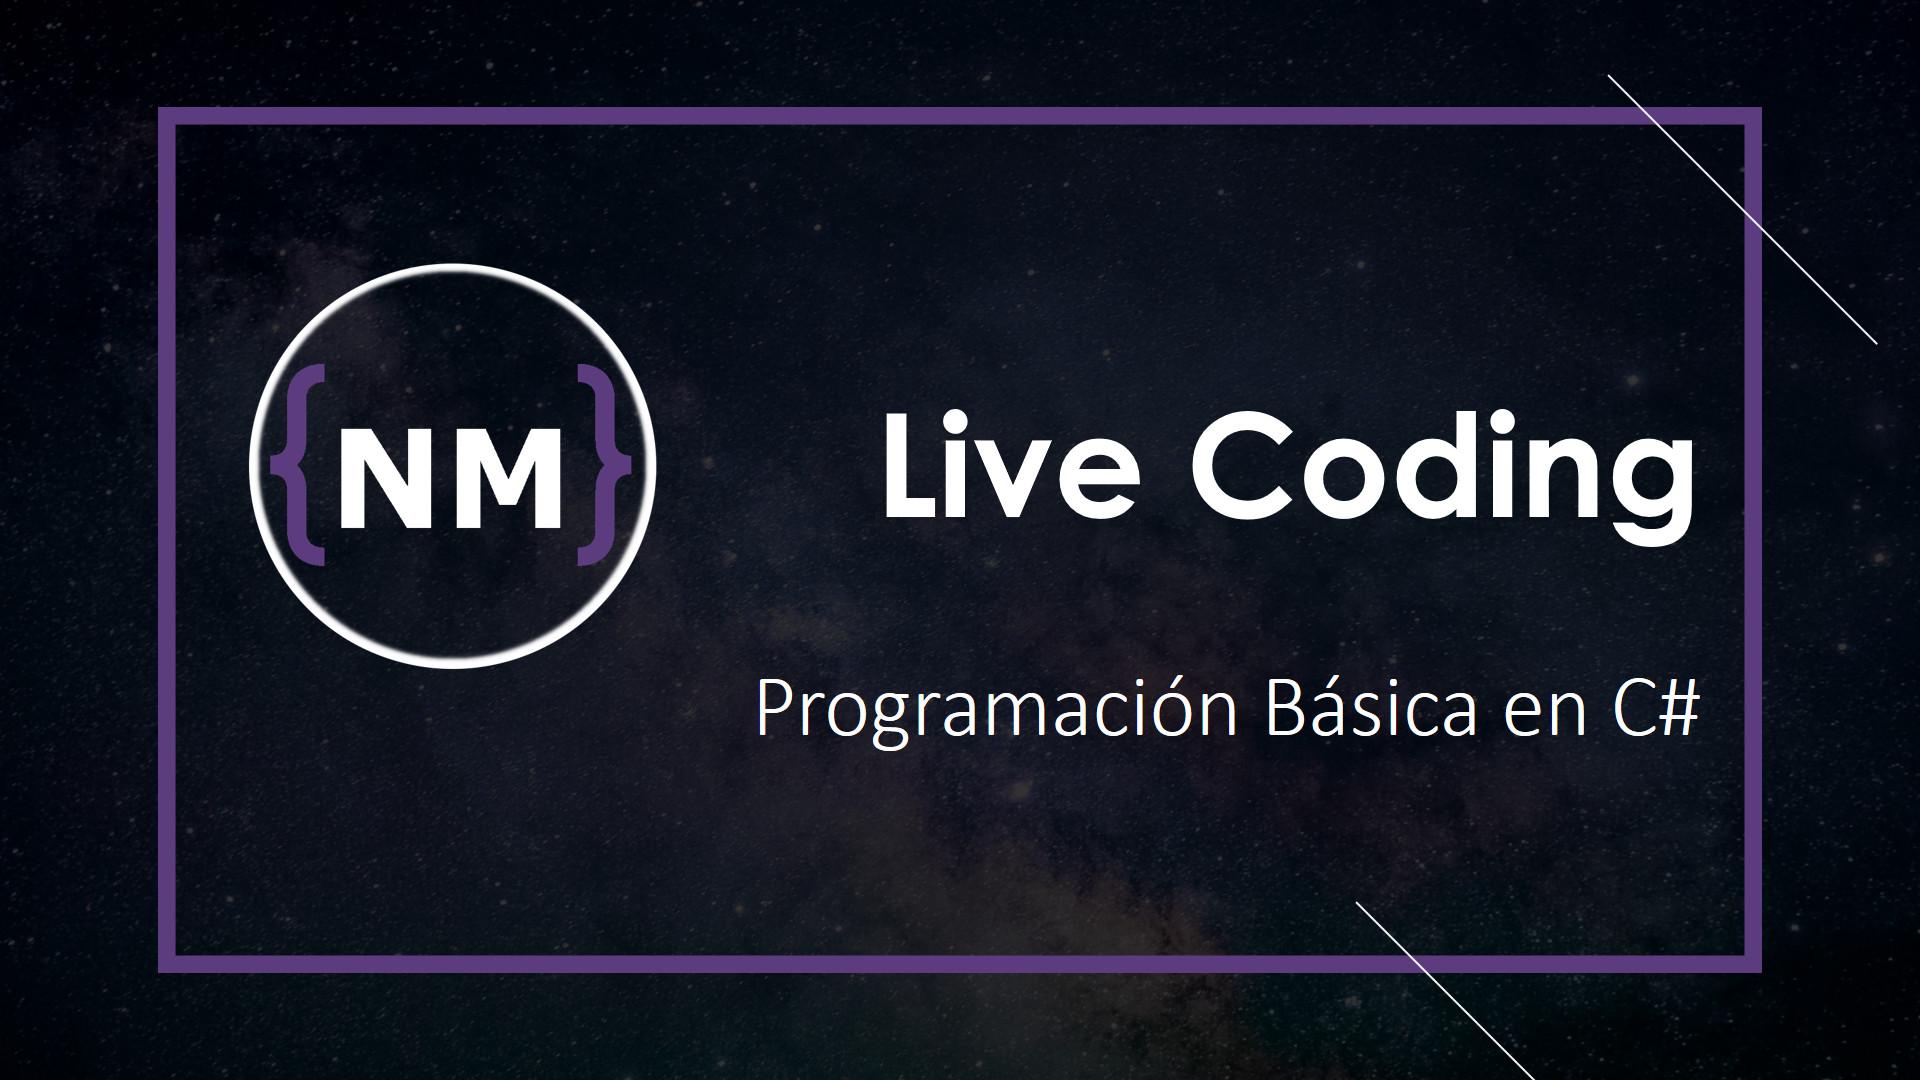 Realización de ejercicios de programación basica en directo. lenguaje c#